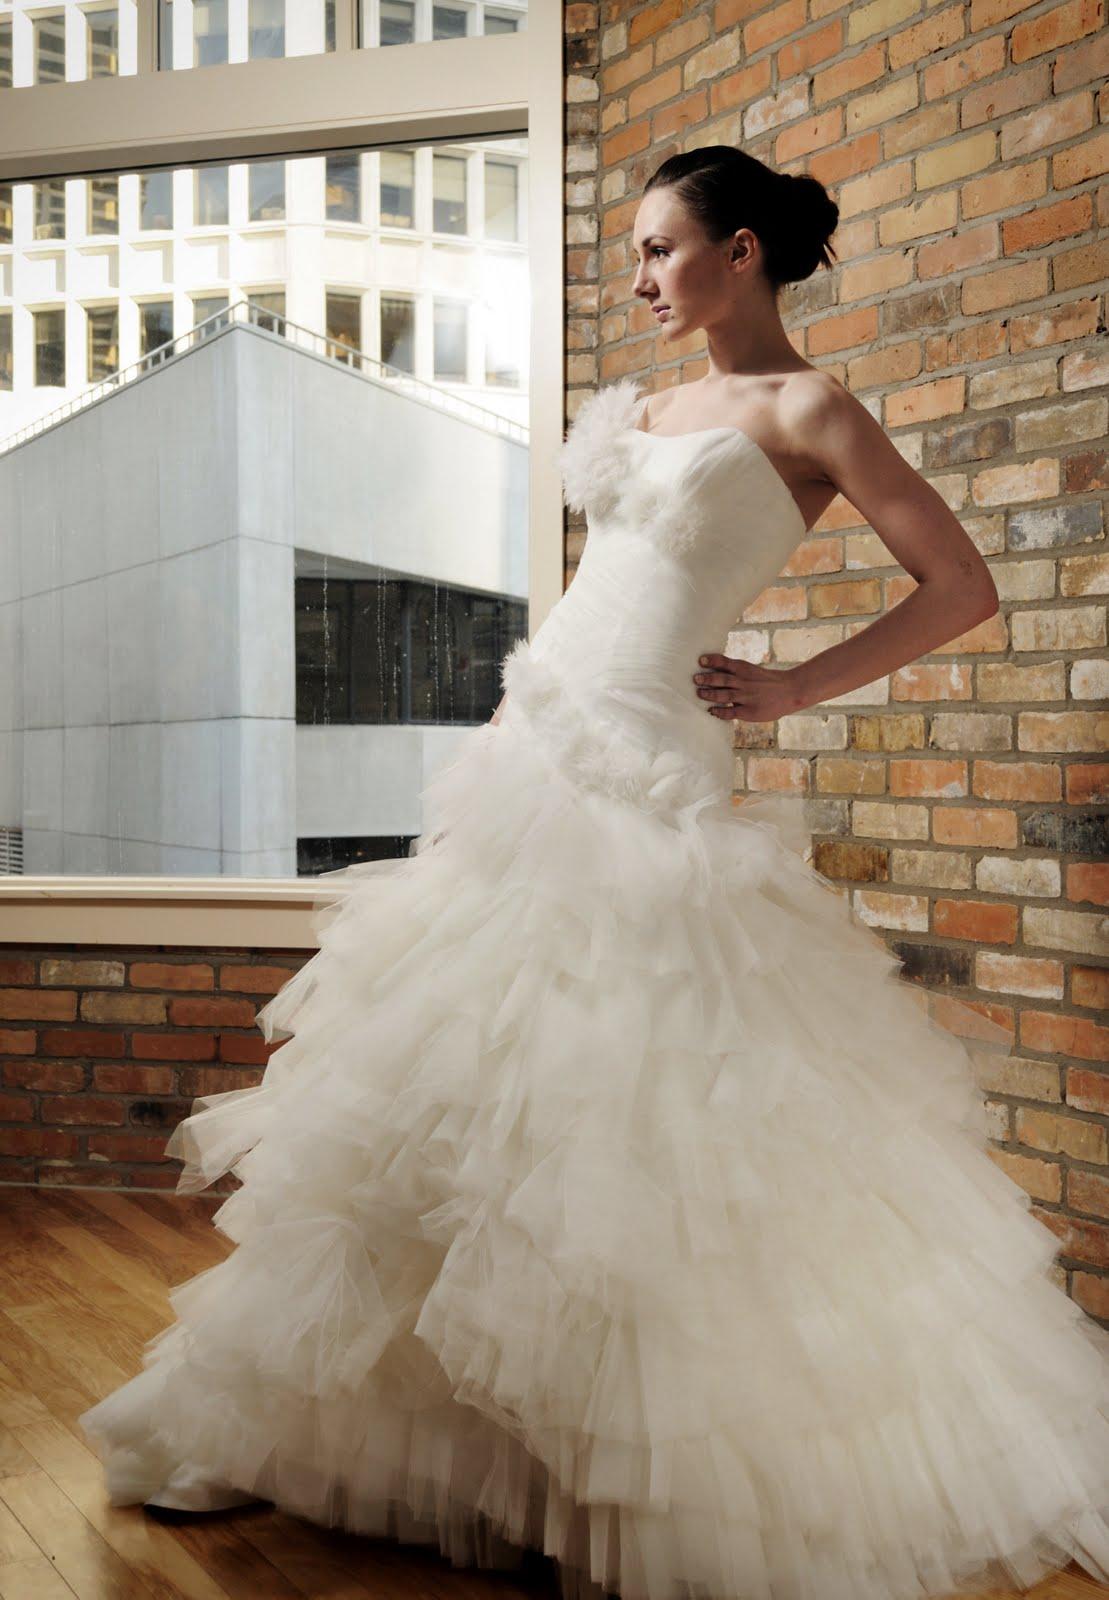 Urban vows april 2011 for Edric woo wedding dresses